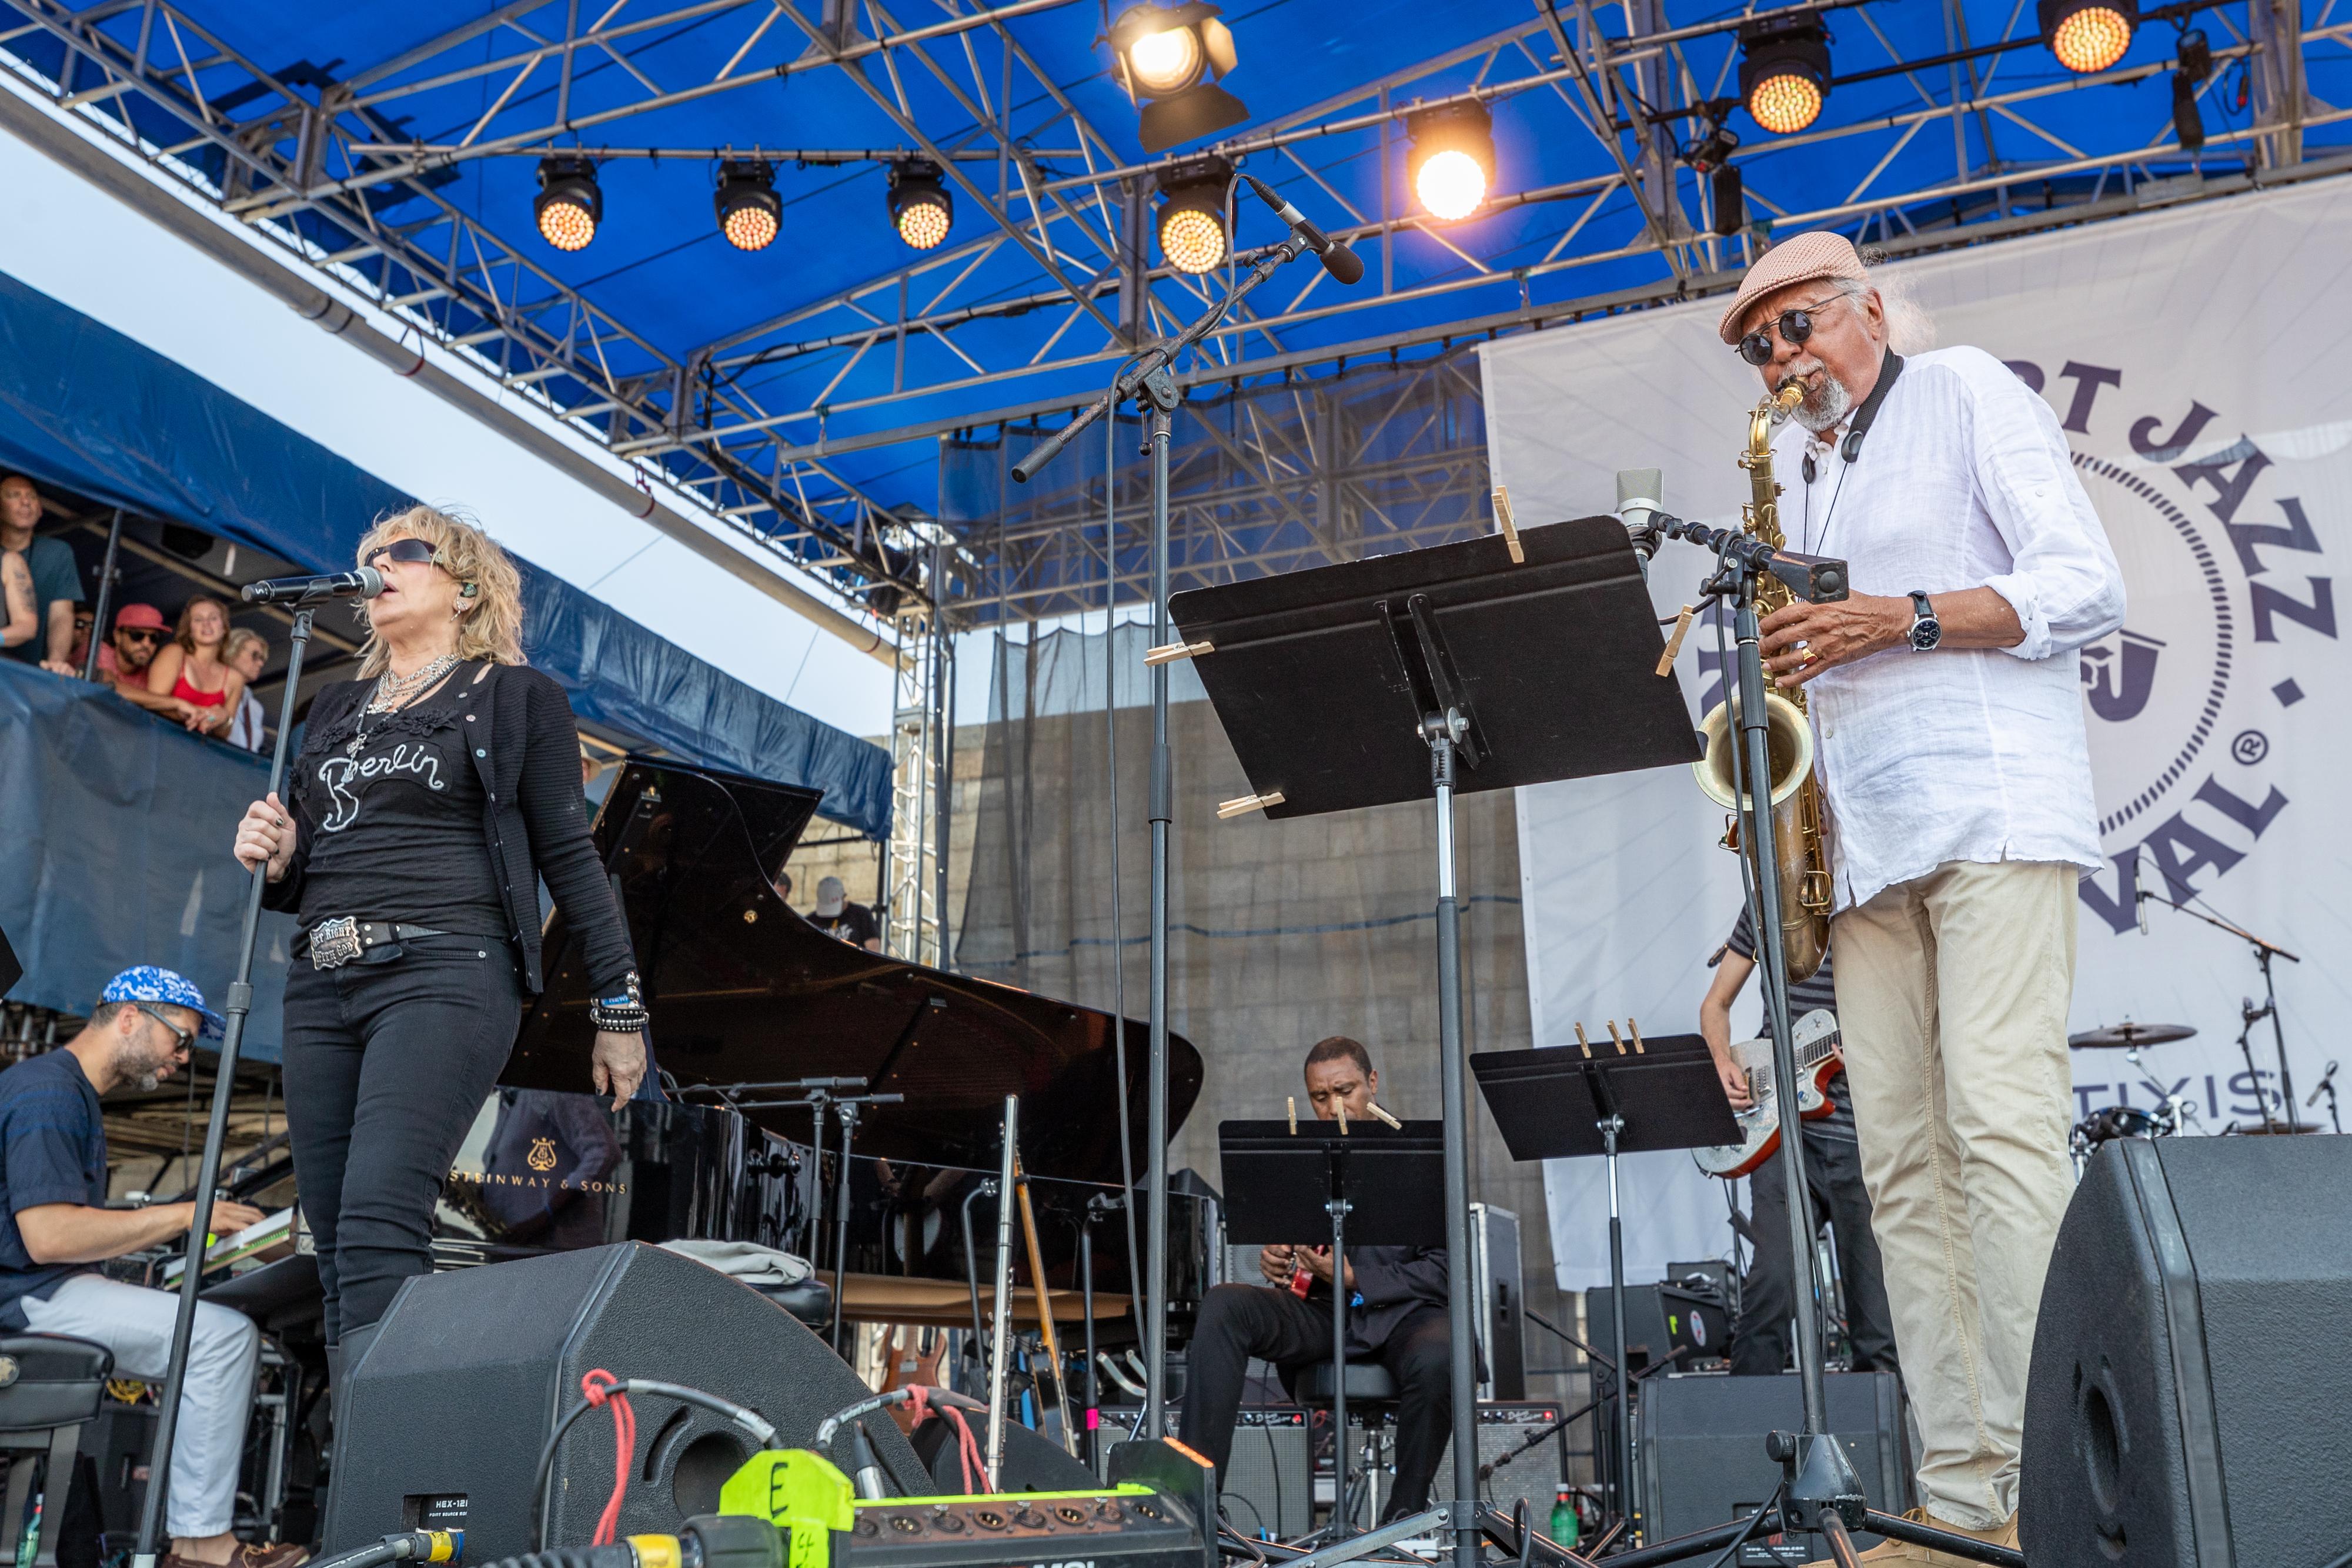 Newport Jazz Festival 2018: 14 Best Things We Saw – Rolling